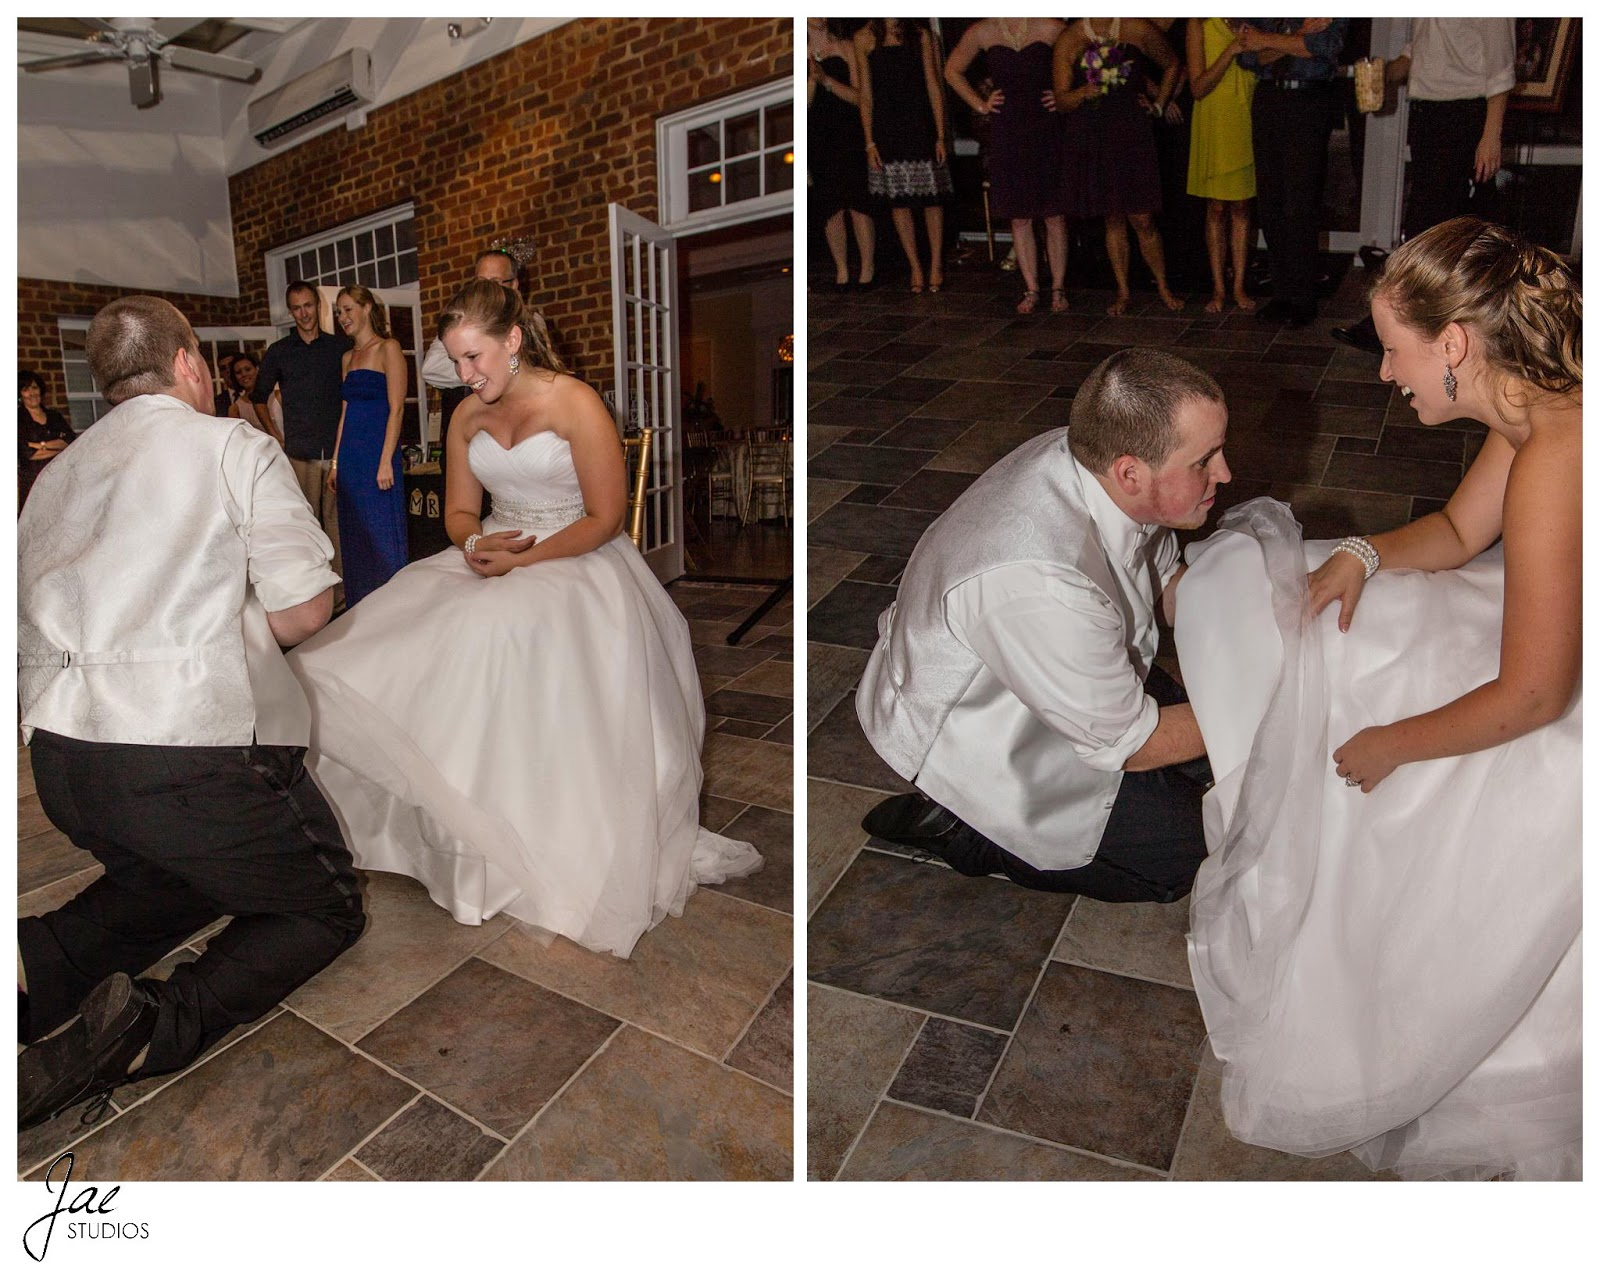 Jonathan and Julie, Bird cage, West Manor Estate, Wedding, Lynchburg, Virginia, Jae Studios, wedding dress, reception, garter toss, groom, bride